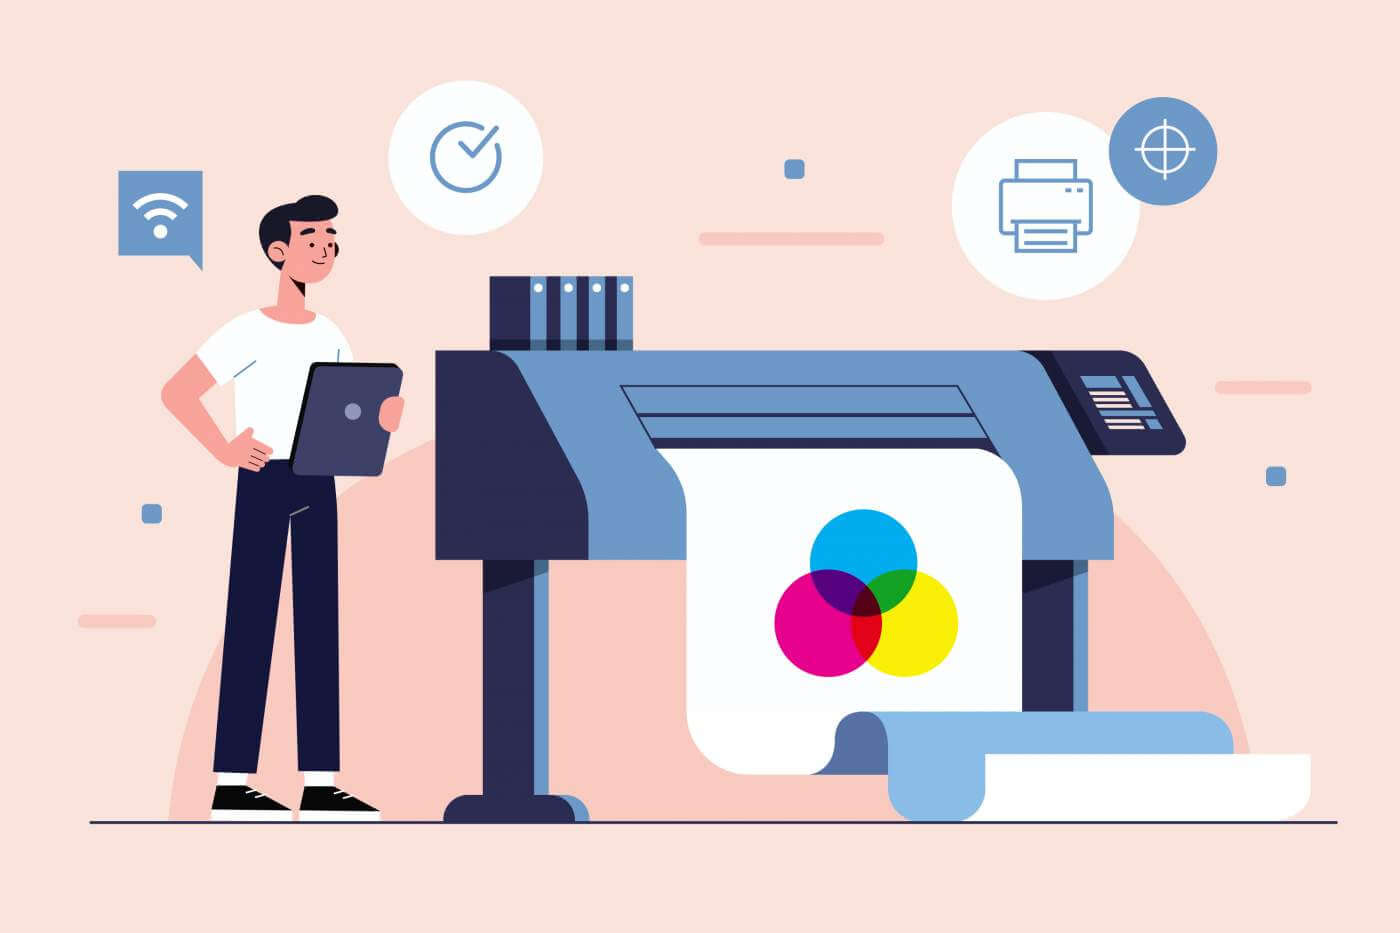 Digital-printing-concept-illustration